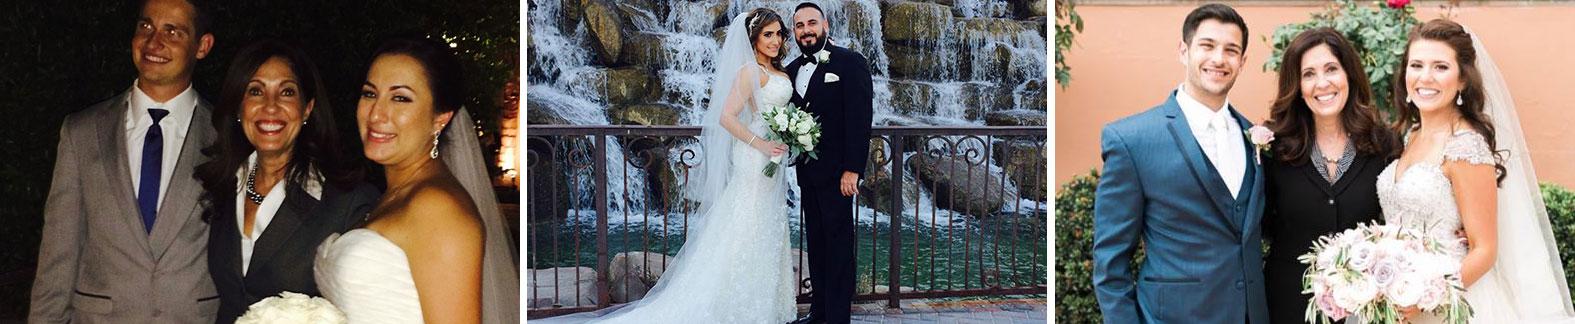 Wedding photos with Reverend Linda Venniro